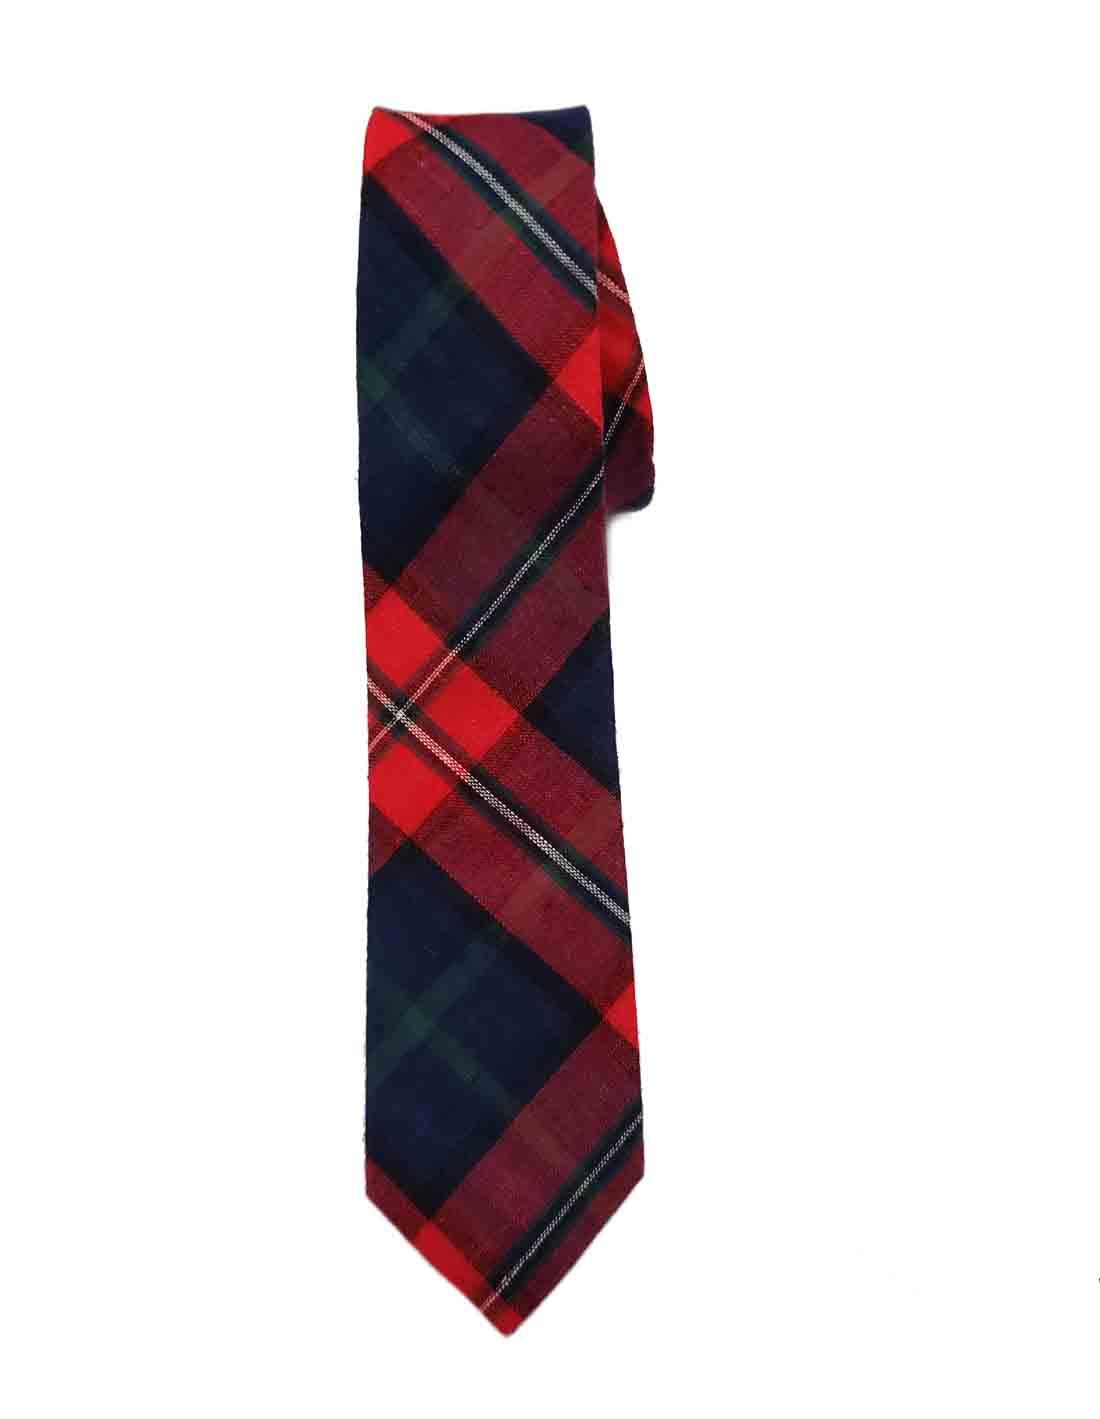 Skinny Tartan Plaid Tie Cotton Red Green Blue Black Men's